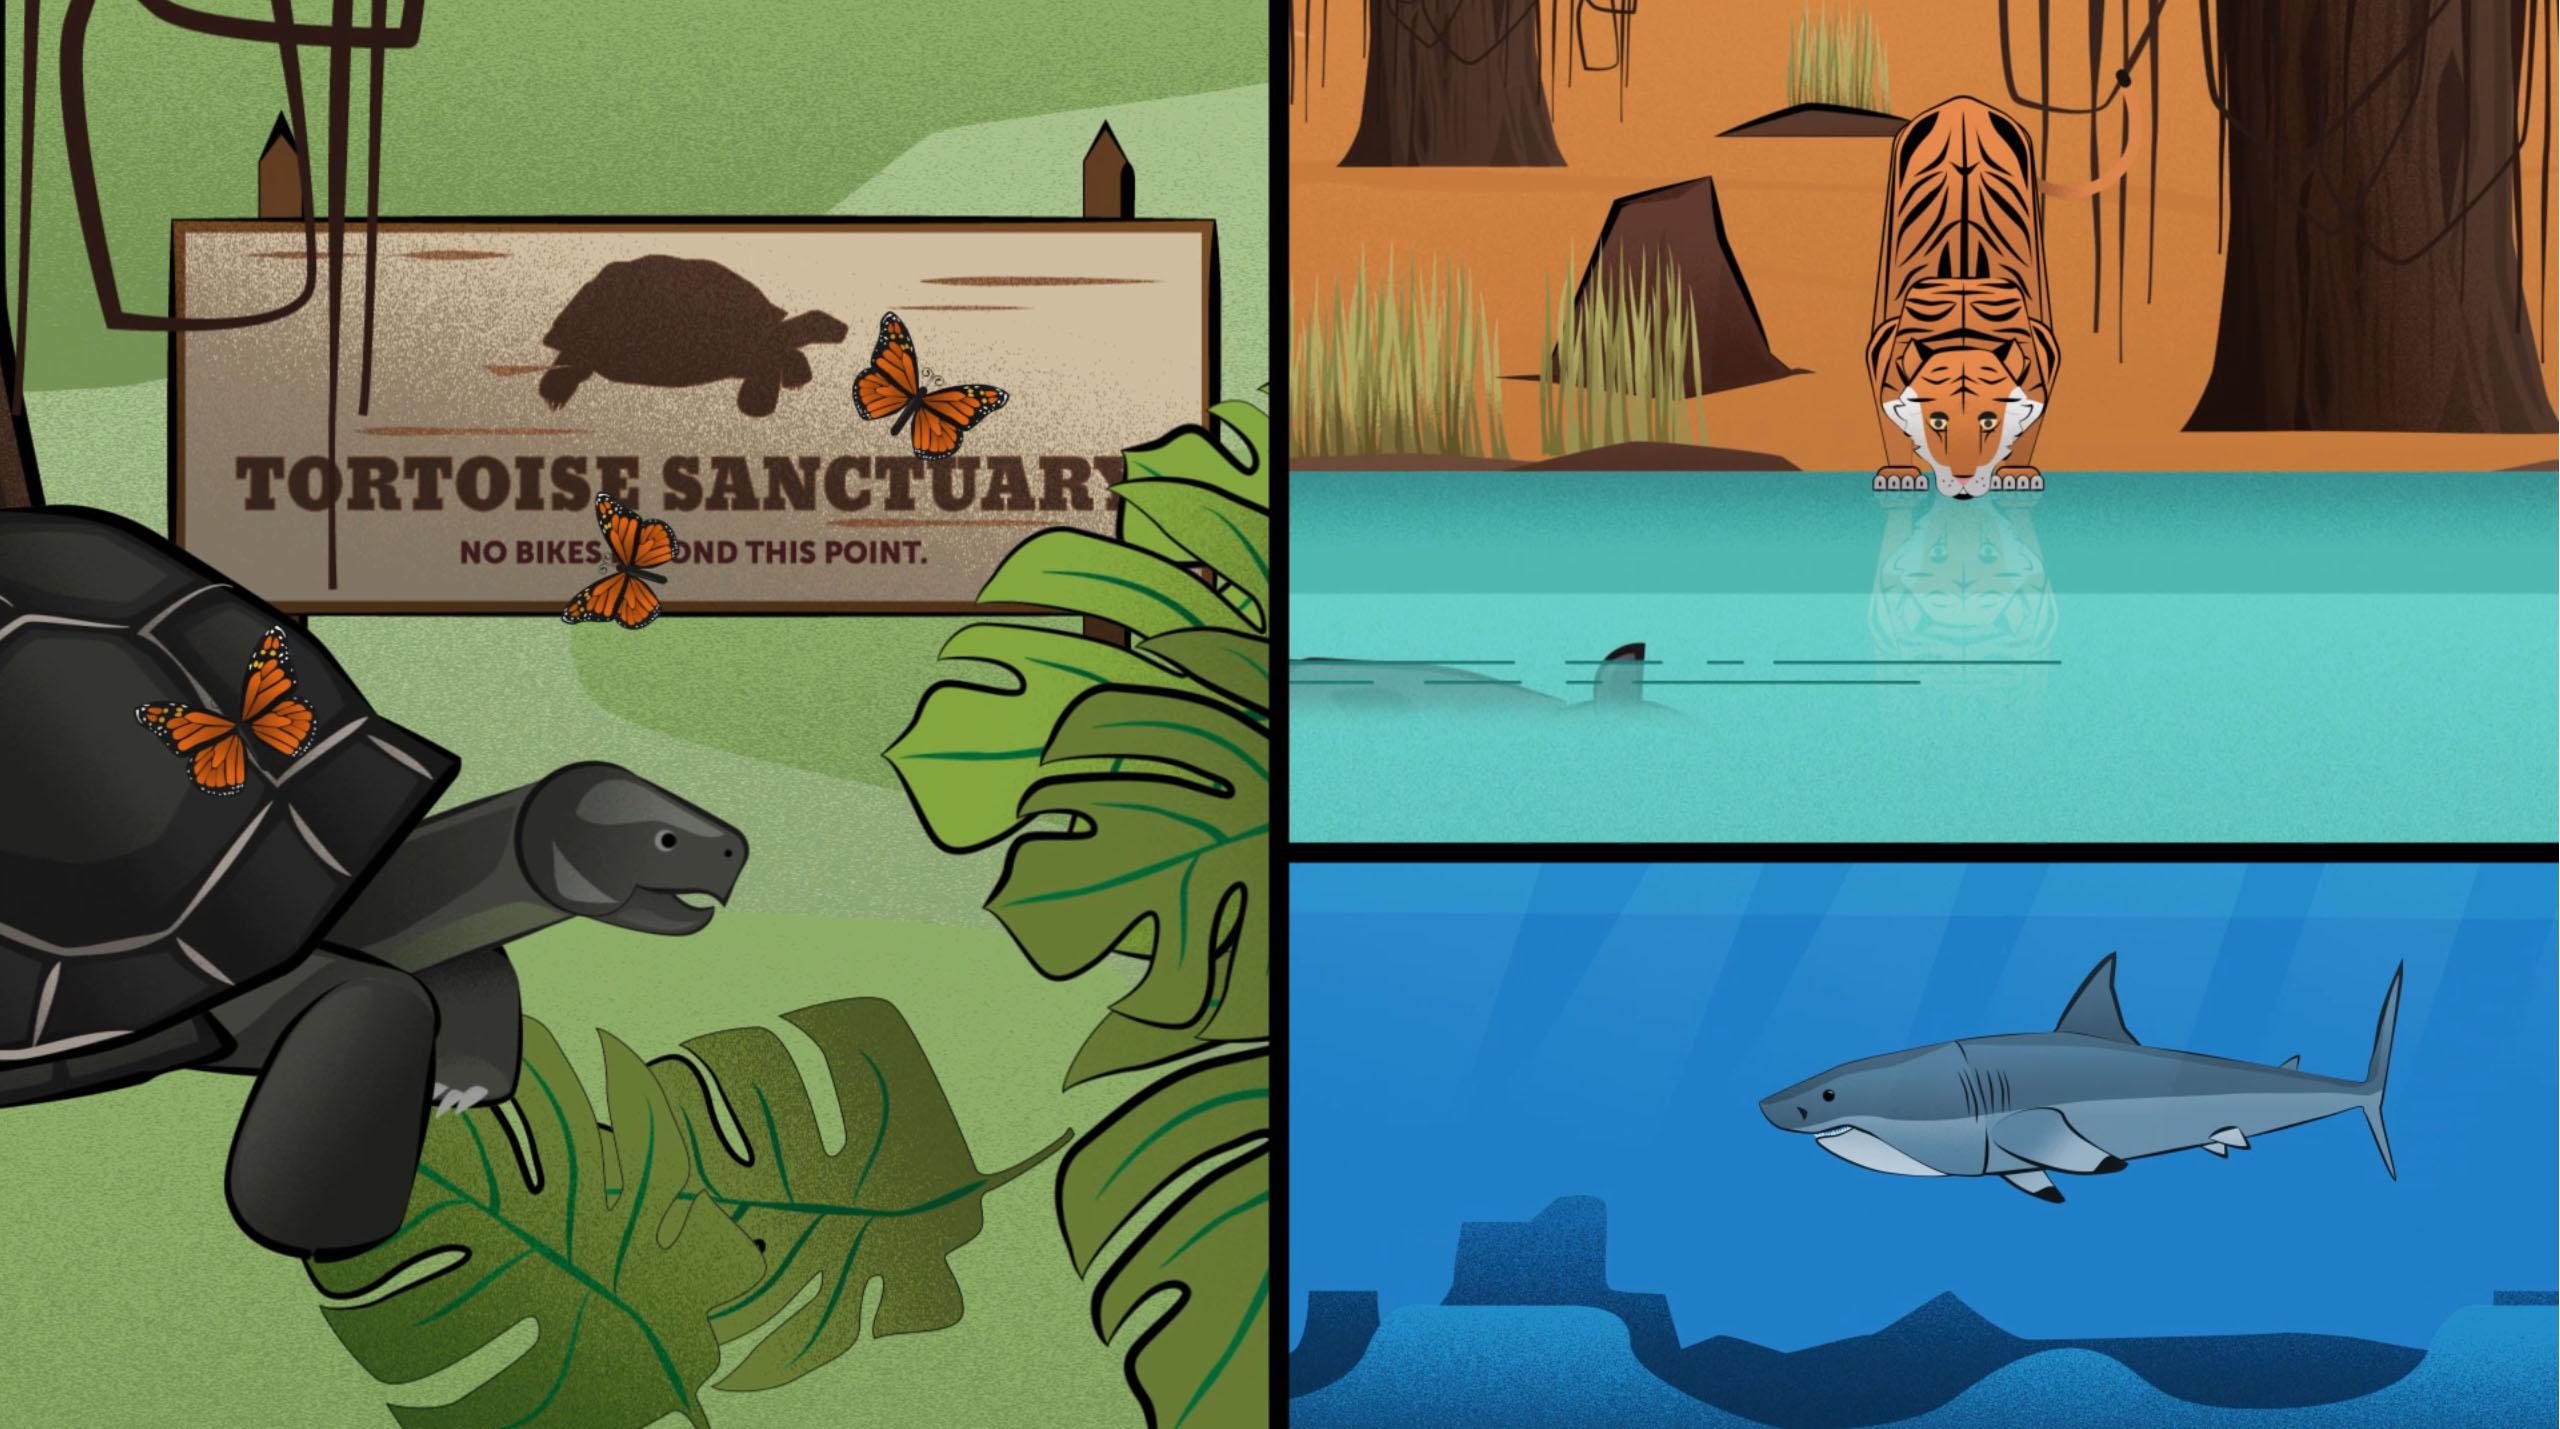 Help keep animals safe in their natural habitats